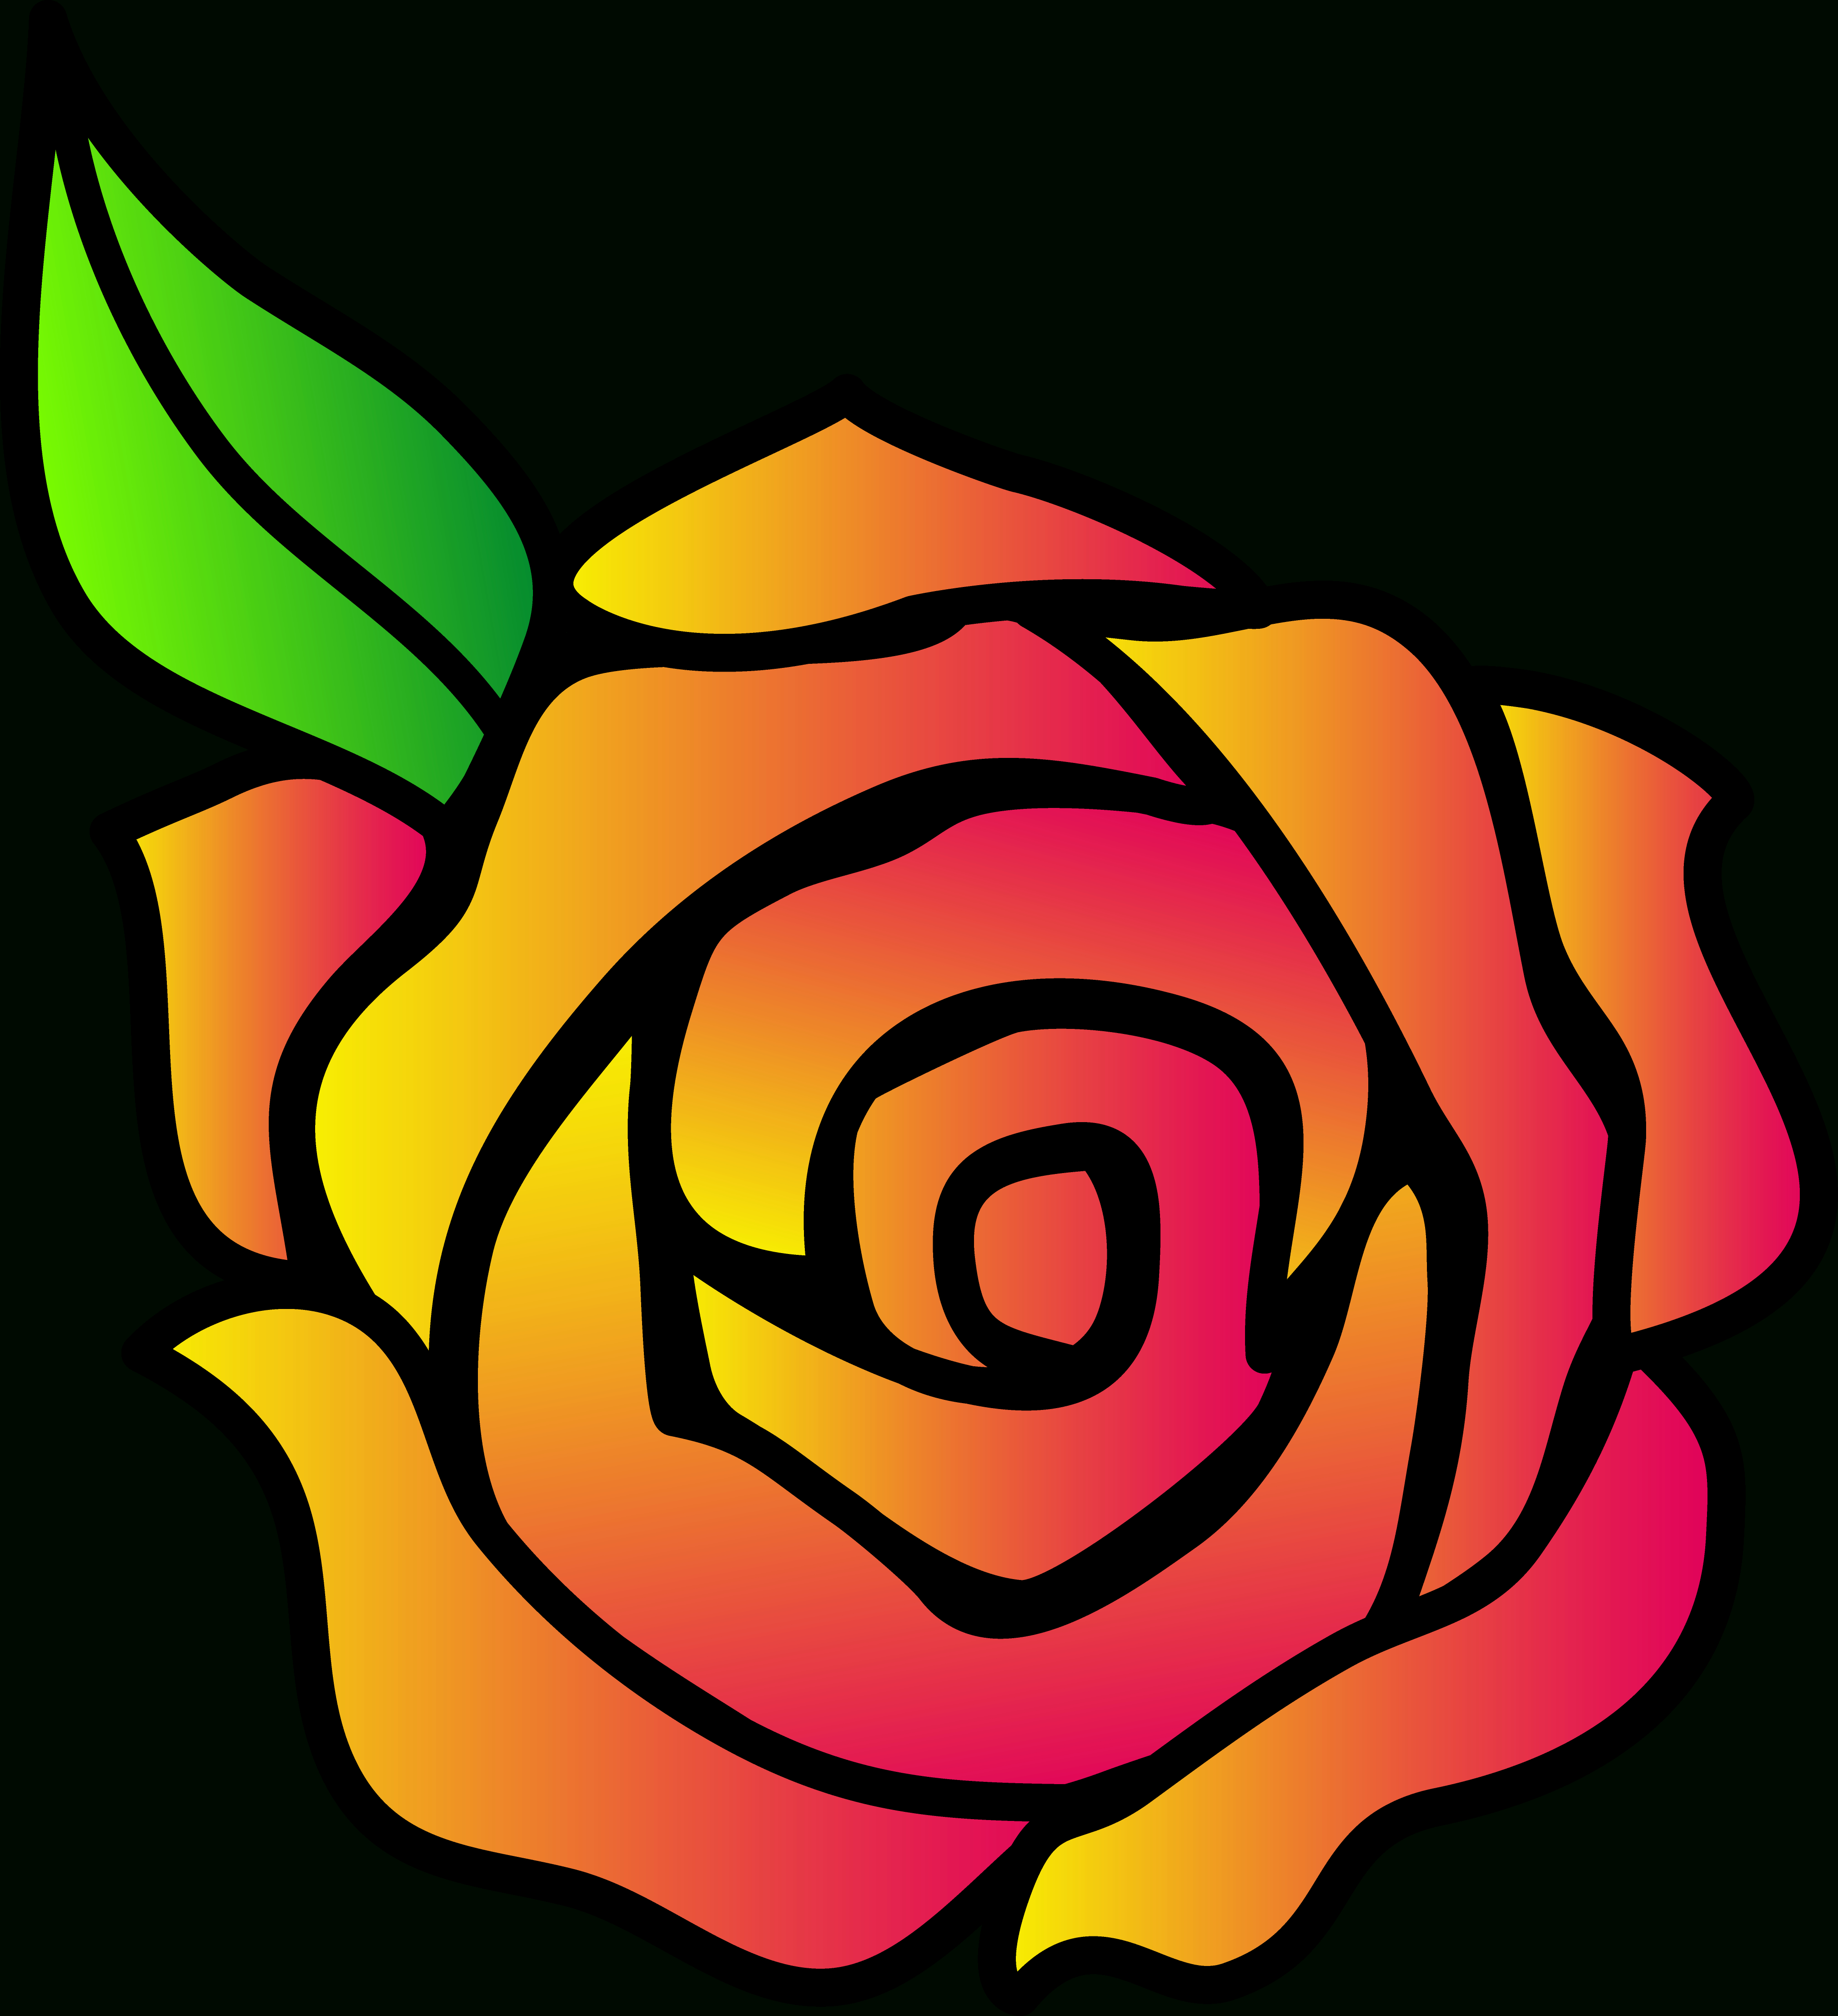 4042x4434 Cartoon Rose Drawing Pink And Yellow Hybrid Rose